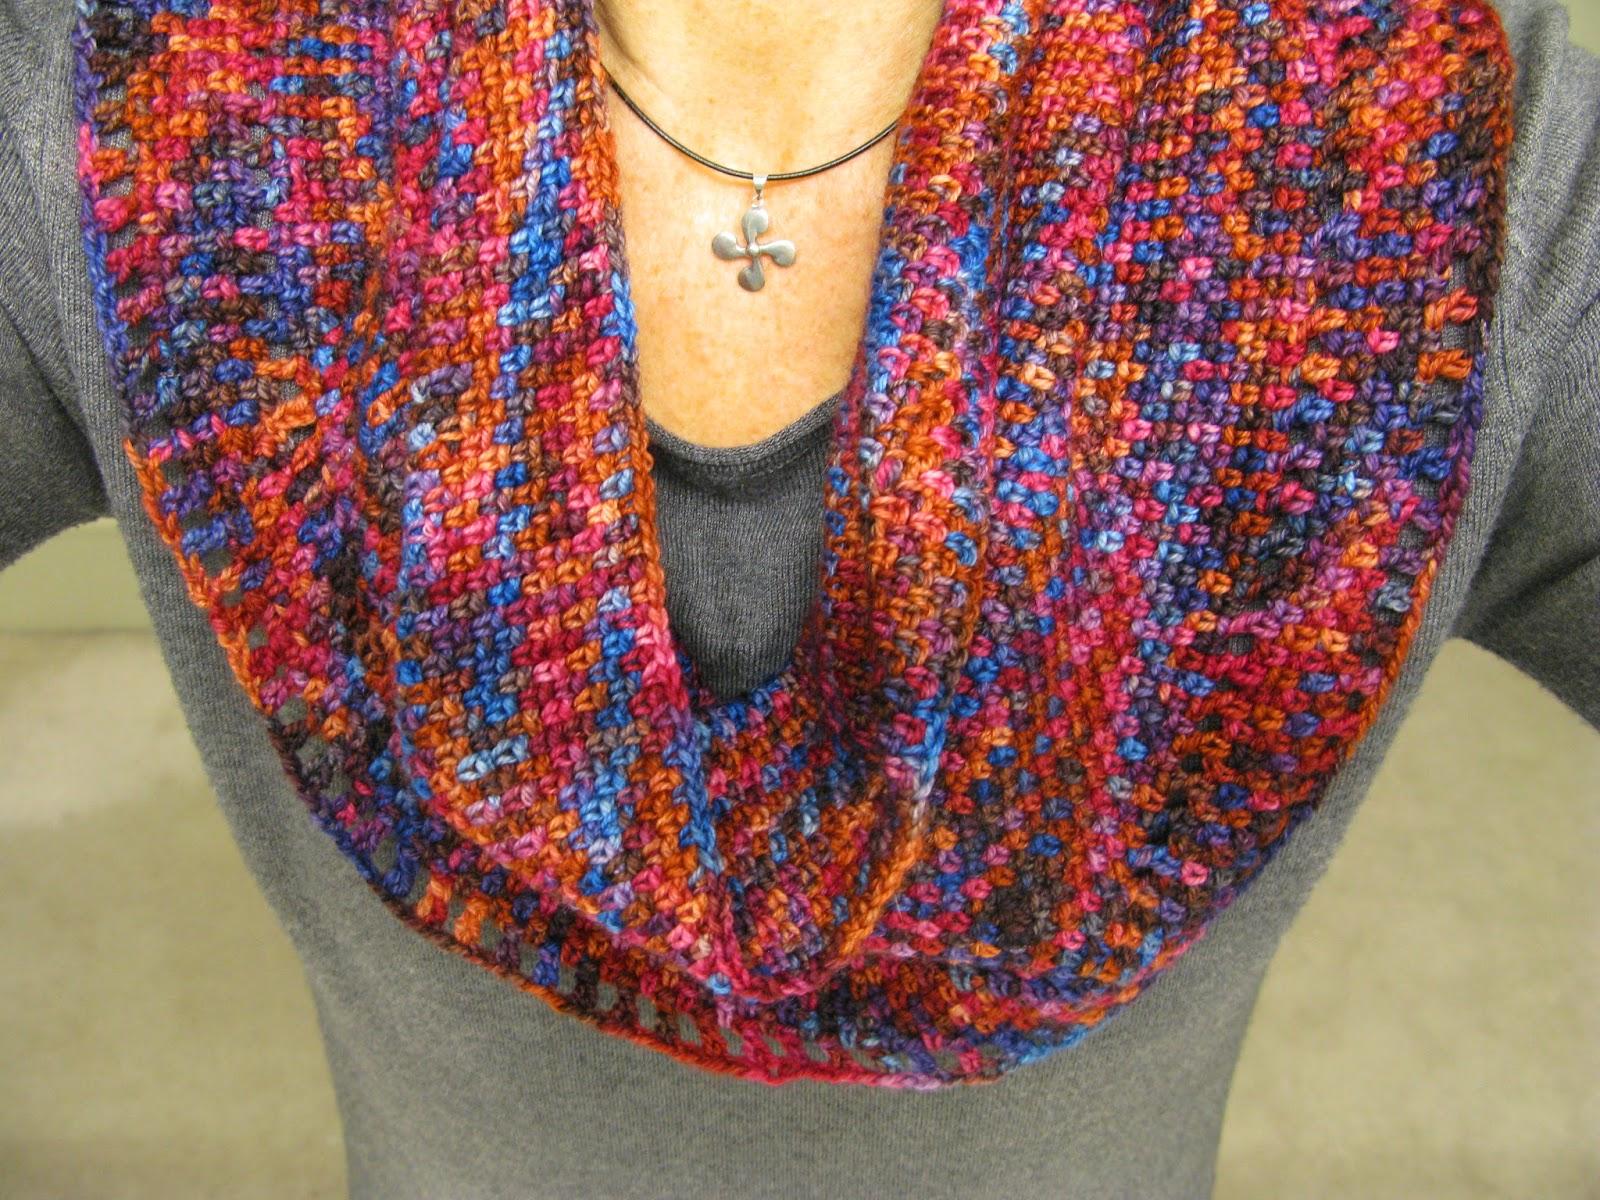 meo my crochet: Crochet Moss Stitch Infinity Scarf